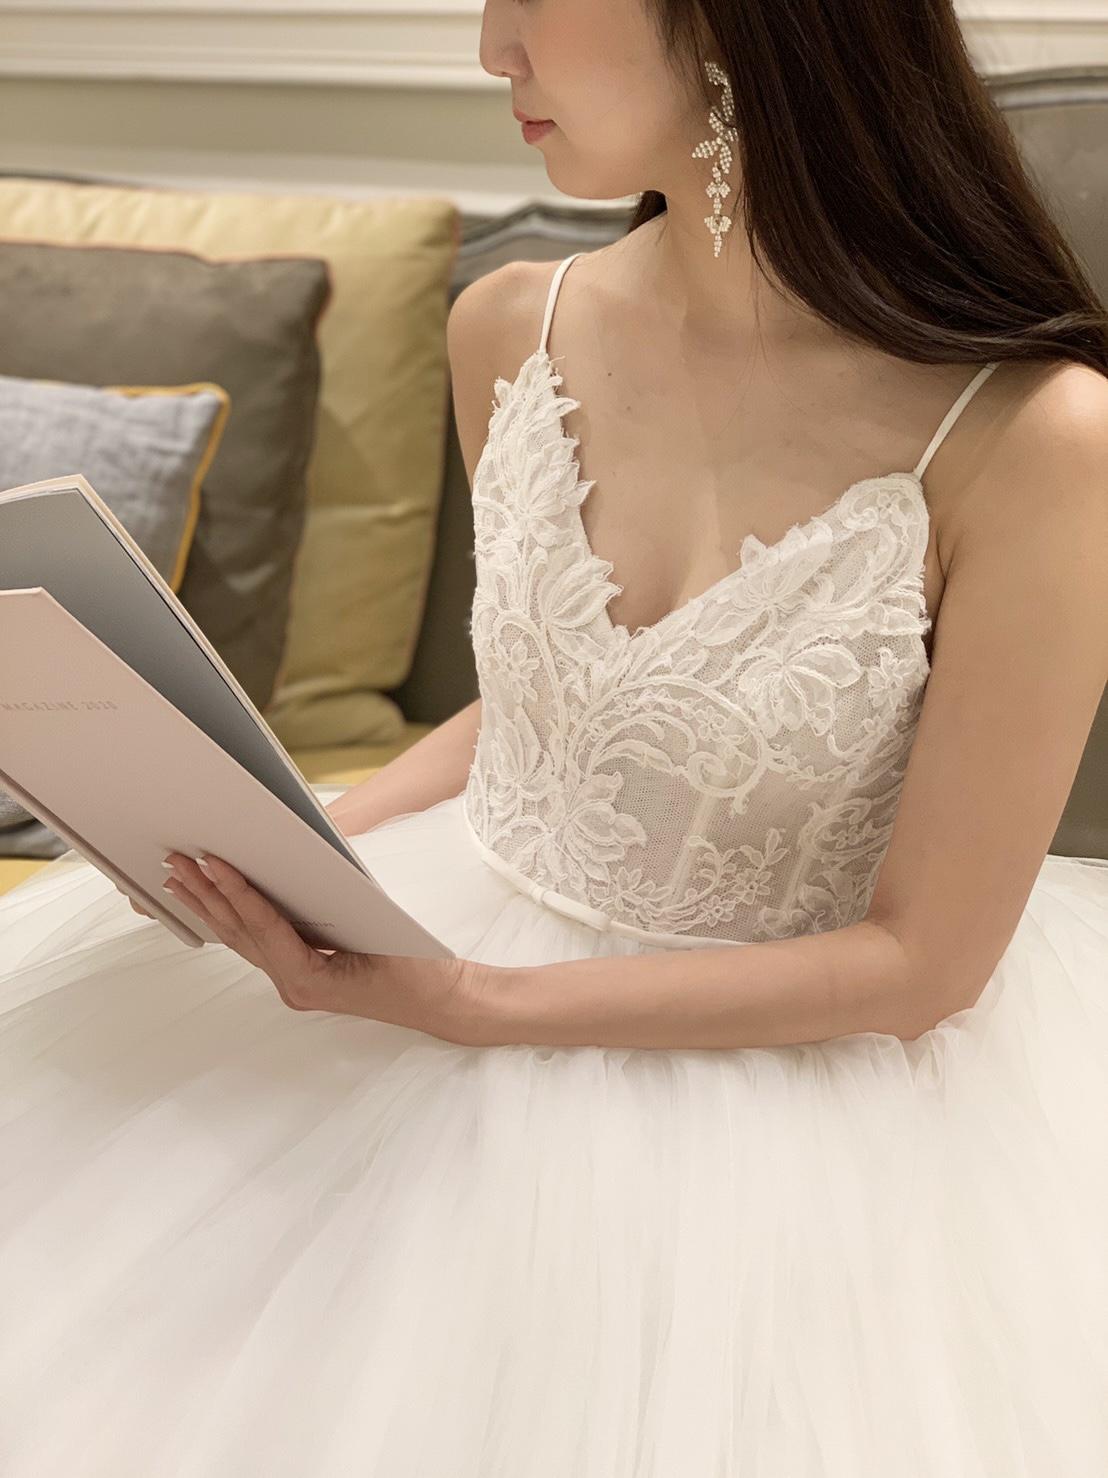 THETREATDRESSING神戸店からMonique LhuillierのAラインのドレスのご紹介